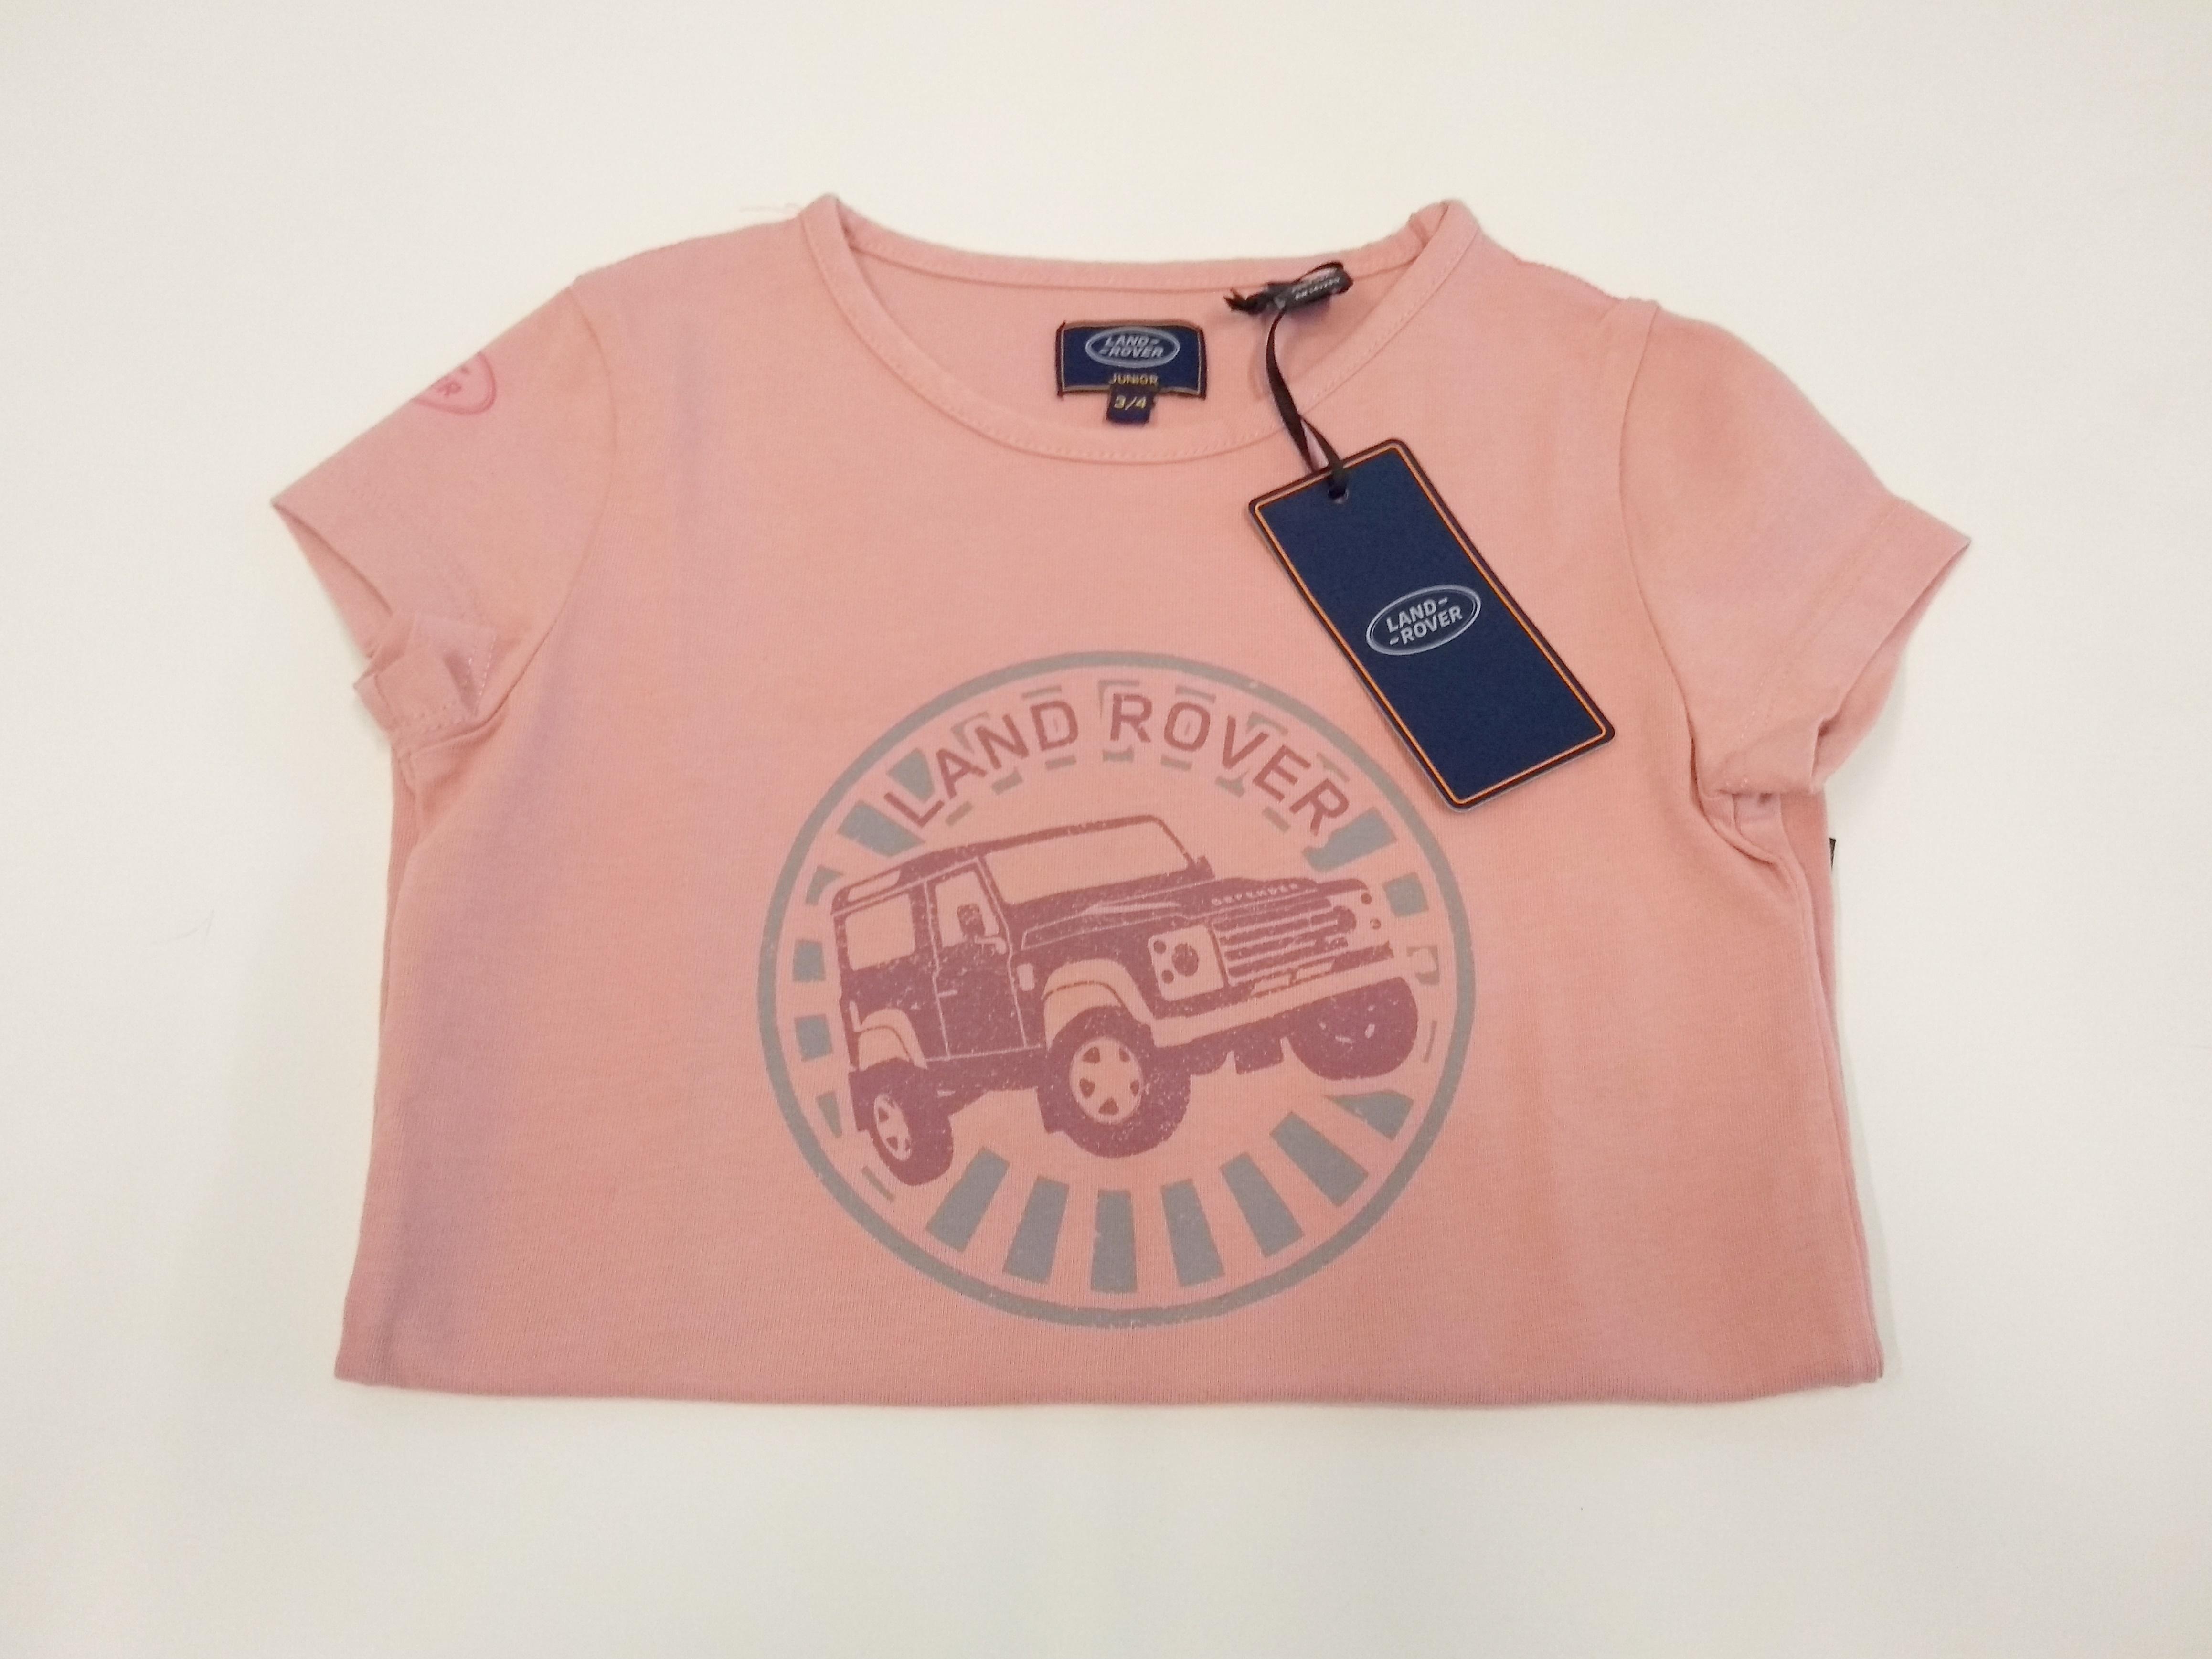 galeria Camiseta Infantil T-shirt Land Rover -